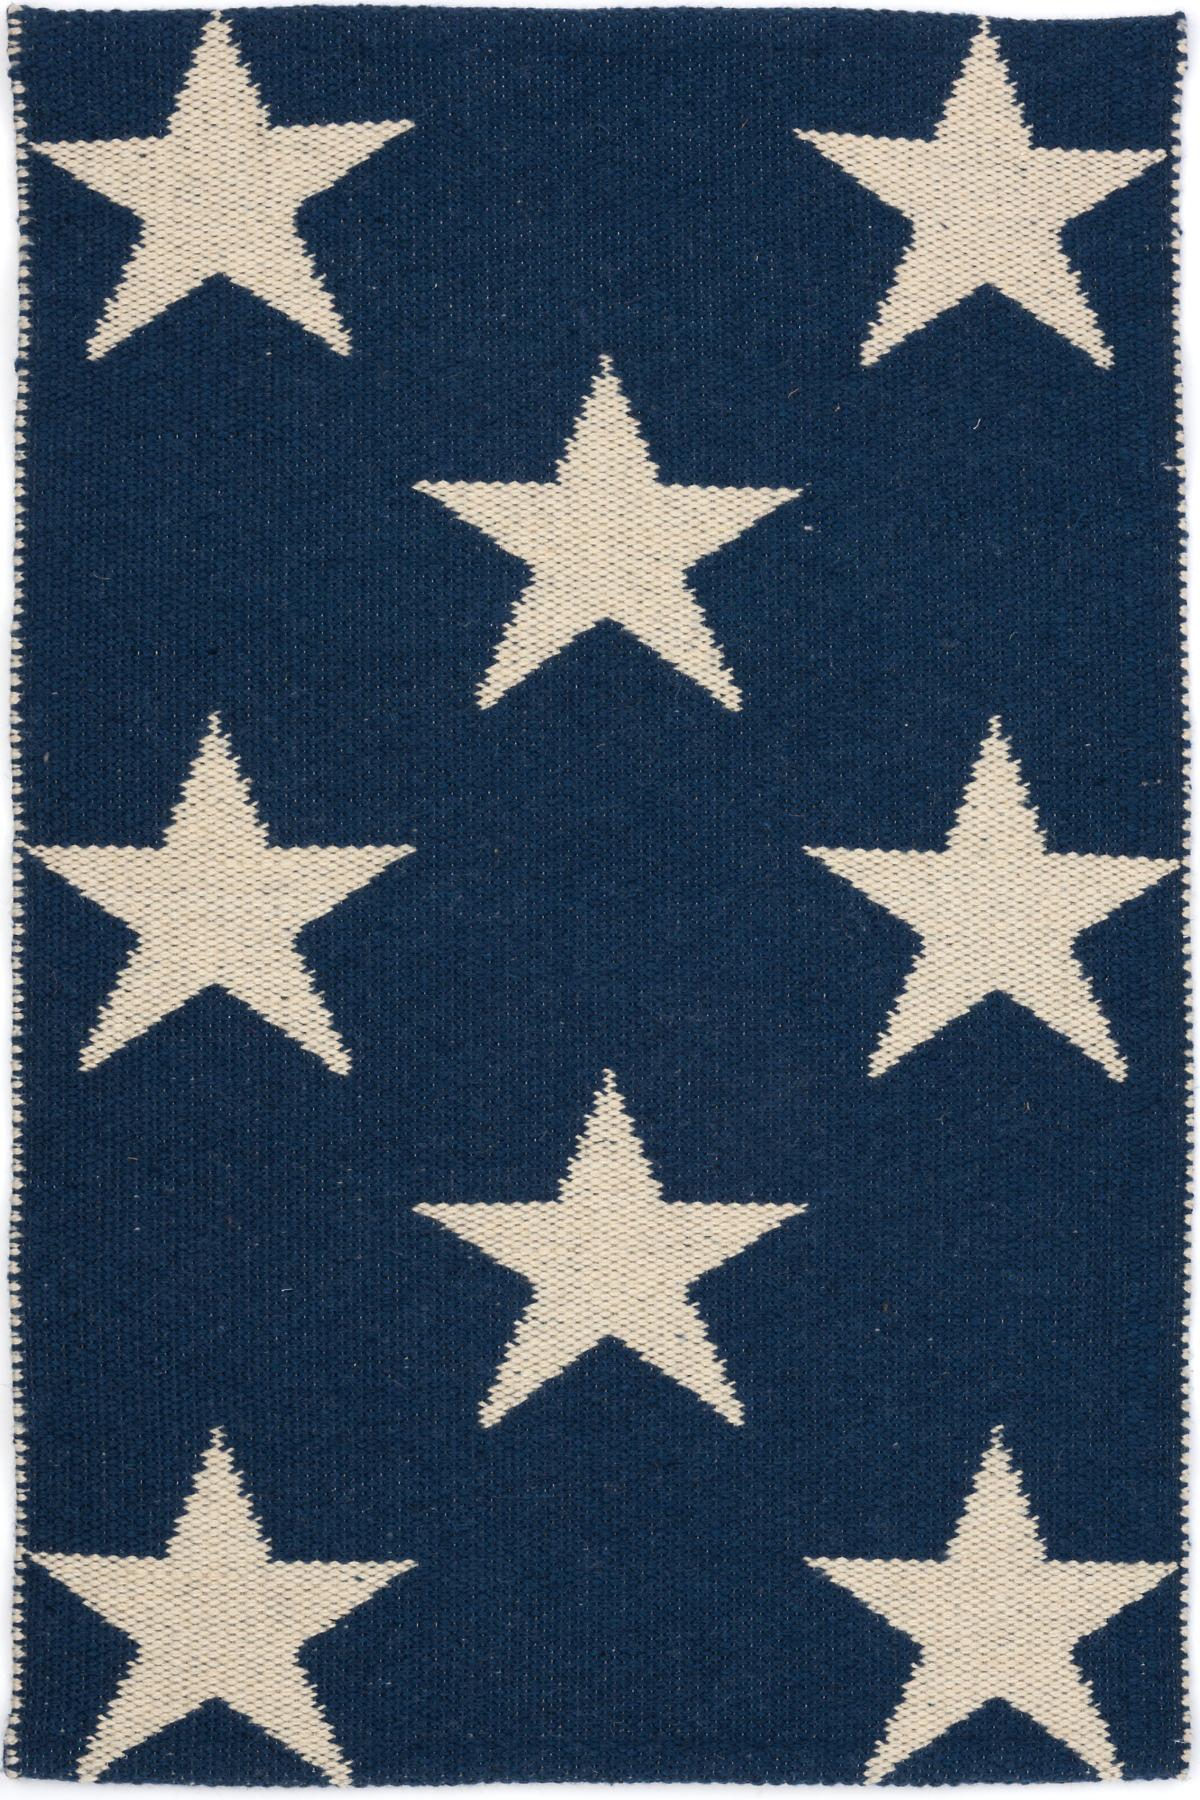 Navy Blue Star Rug - Home Decorating